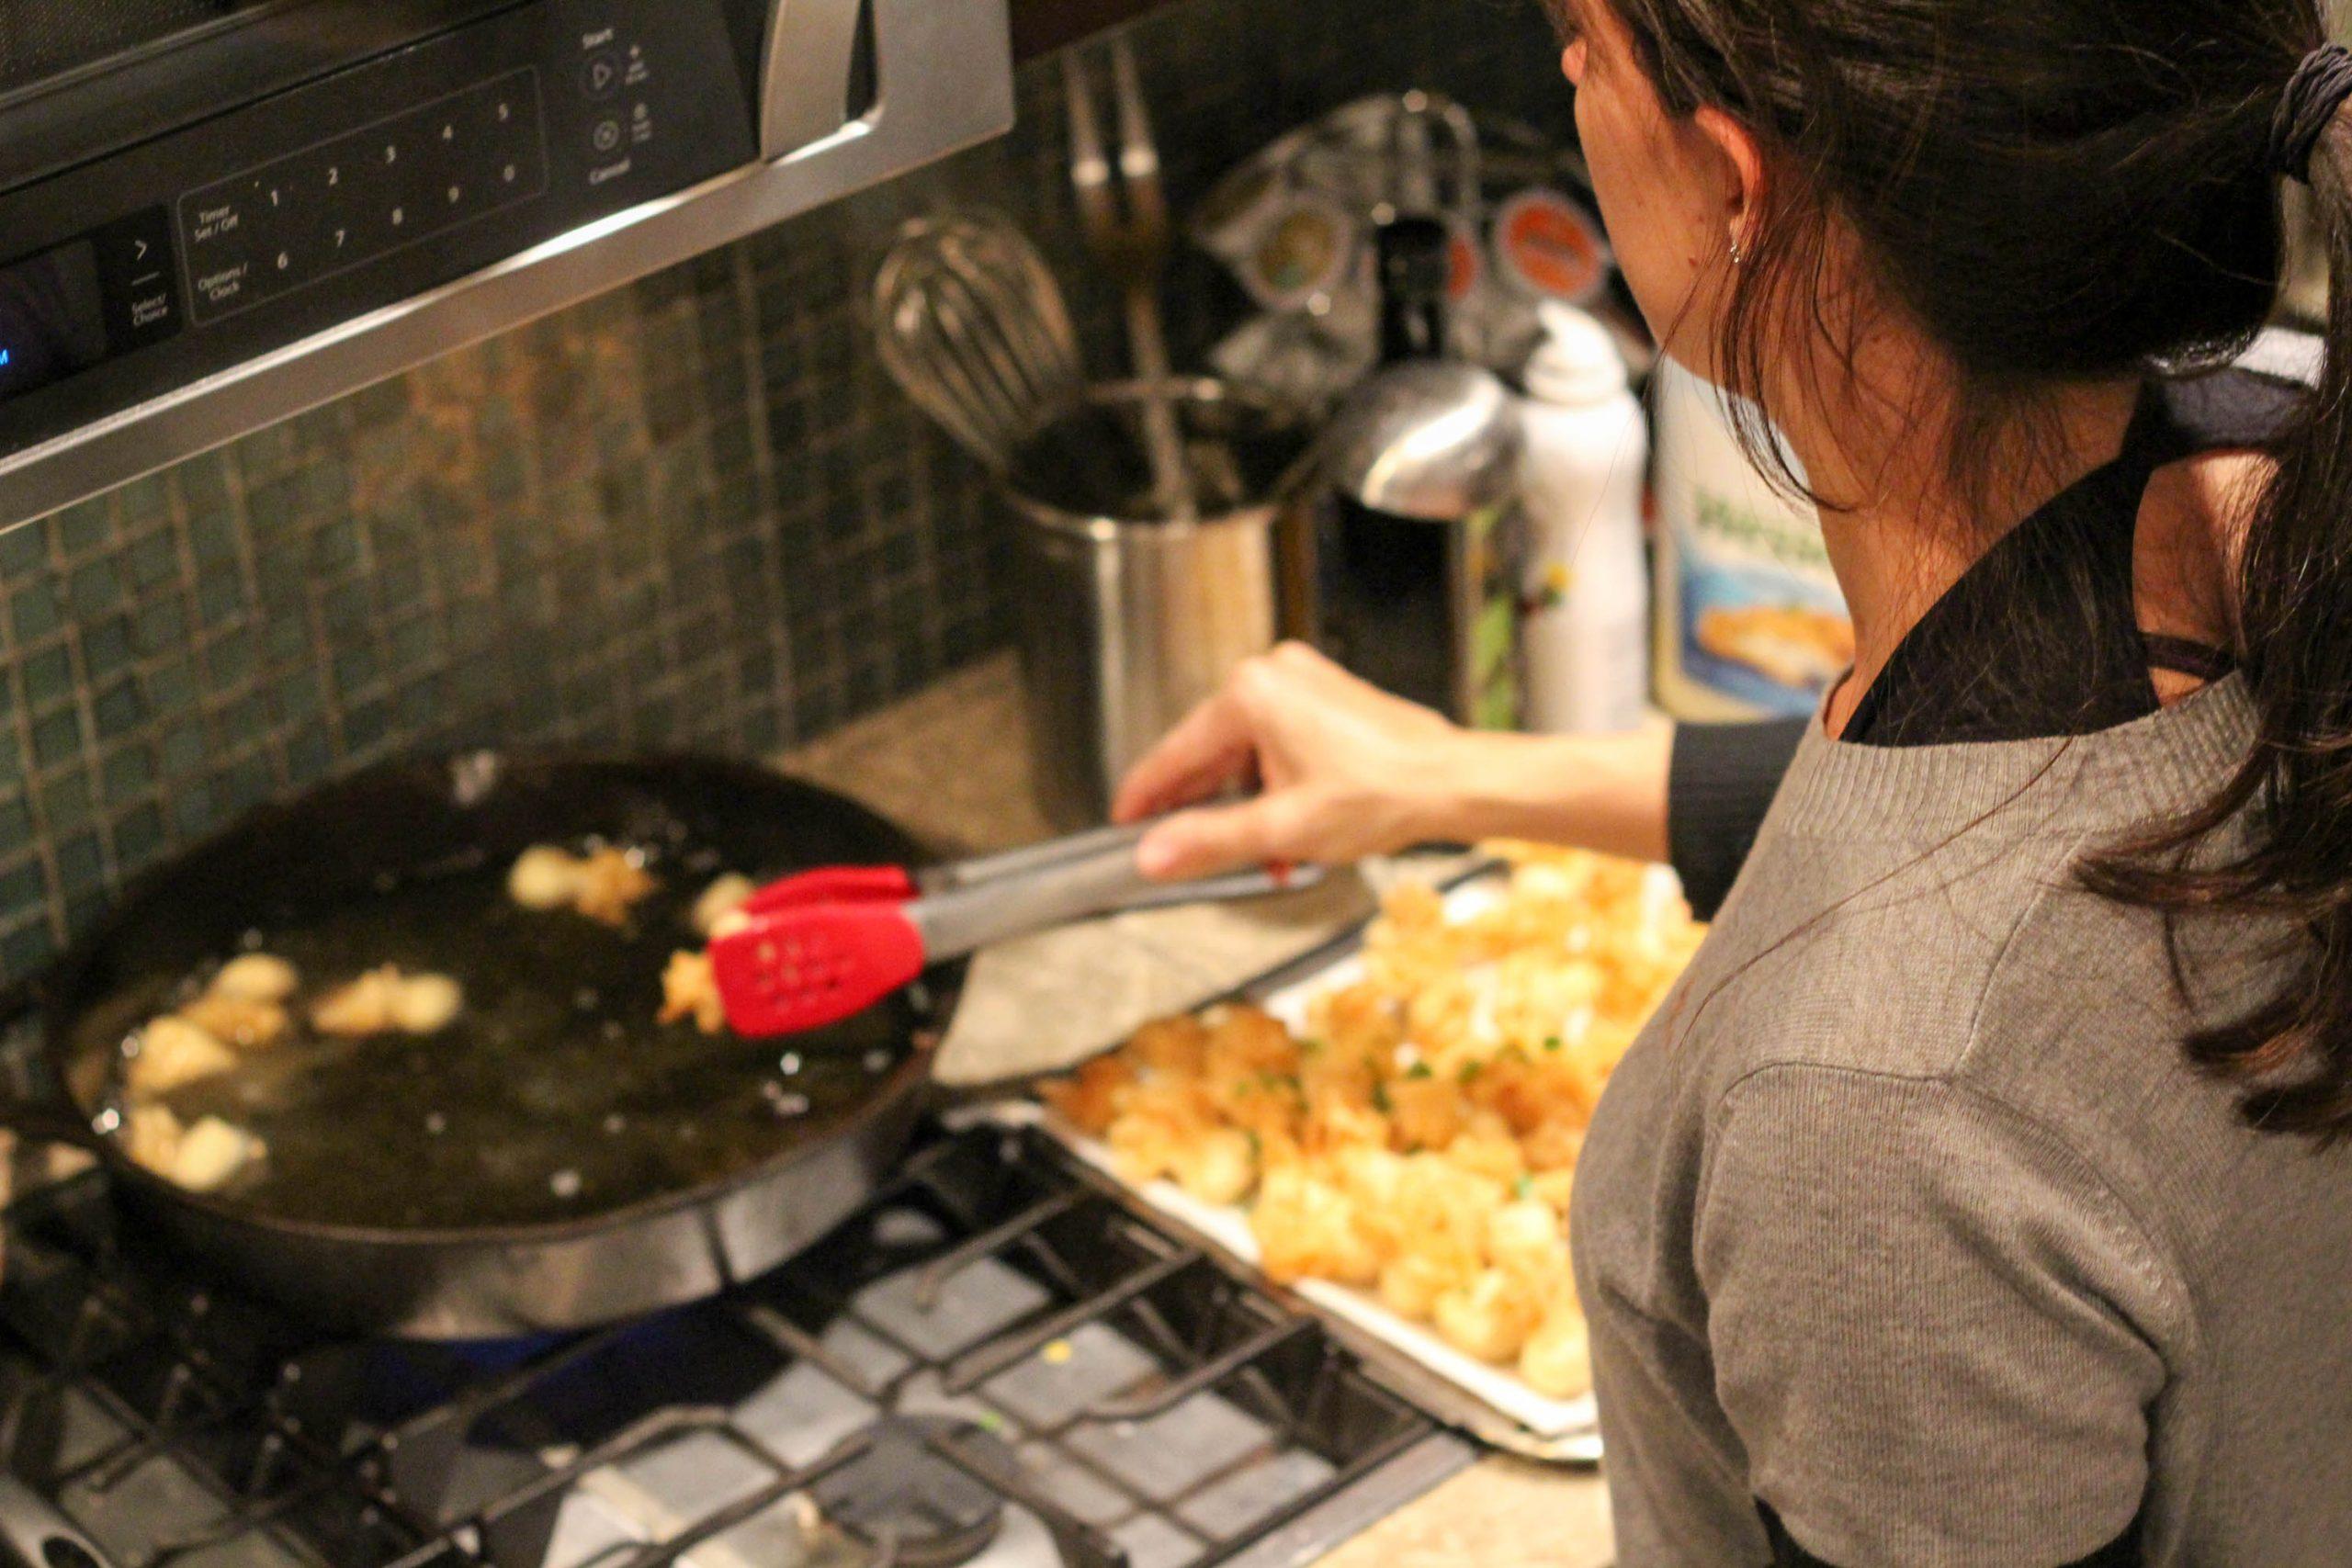 Me frying crab puffs